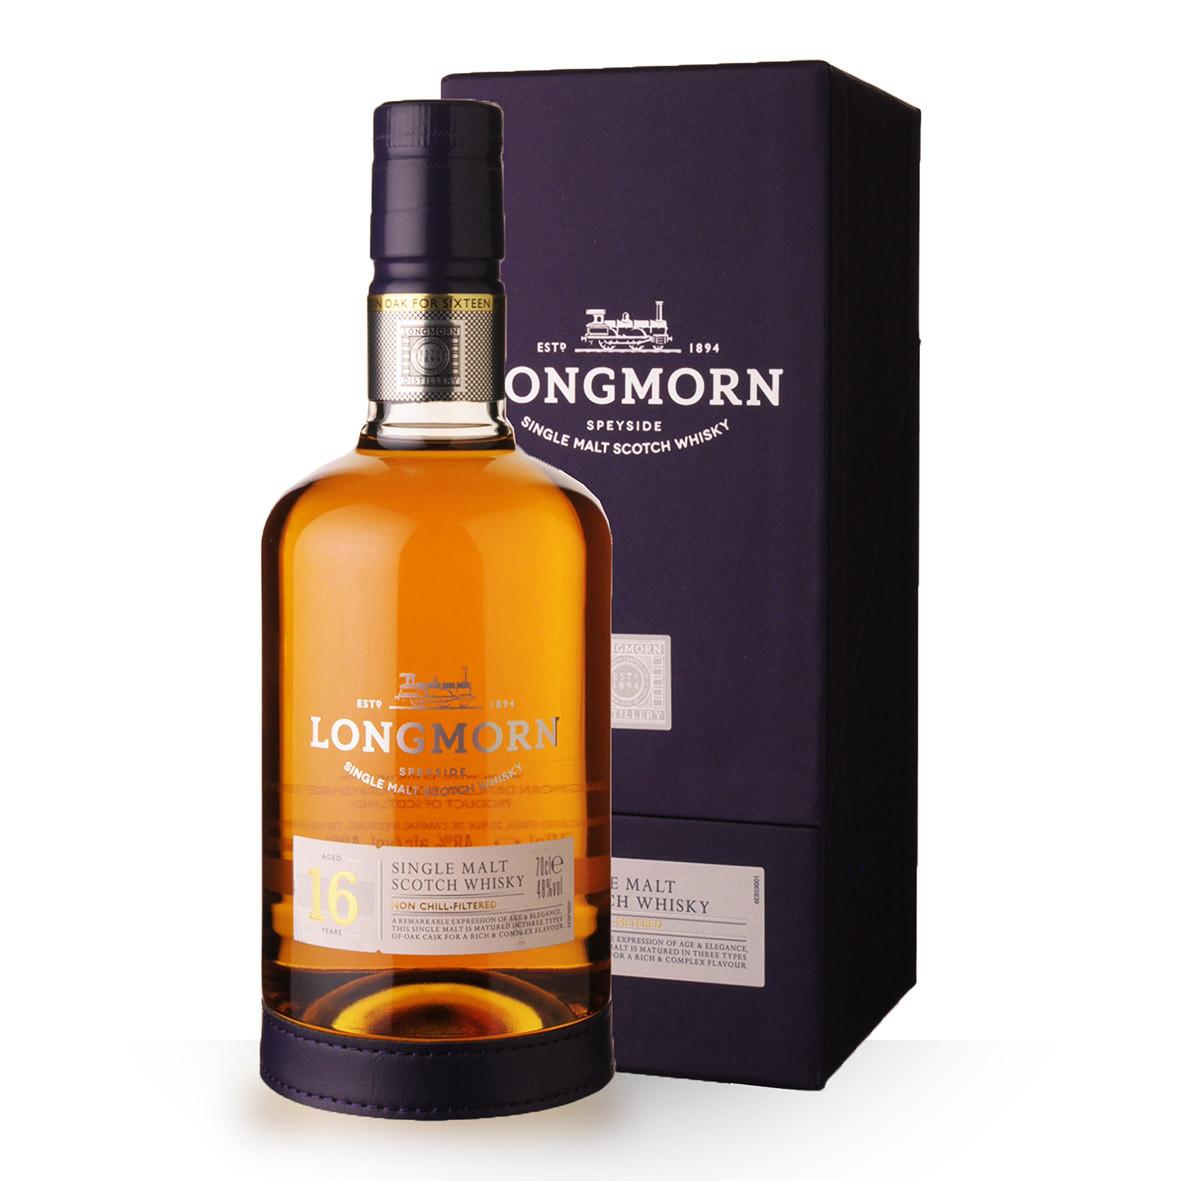 Whisky Longmorn 16 ans 70cl Coffret www.odyssee-vins.com